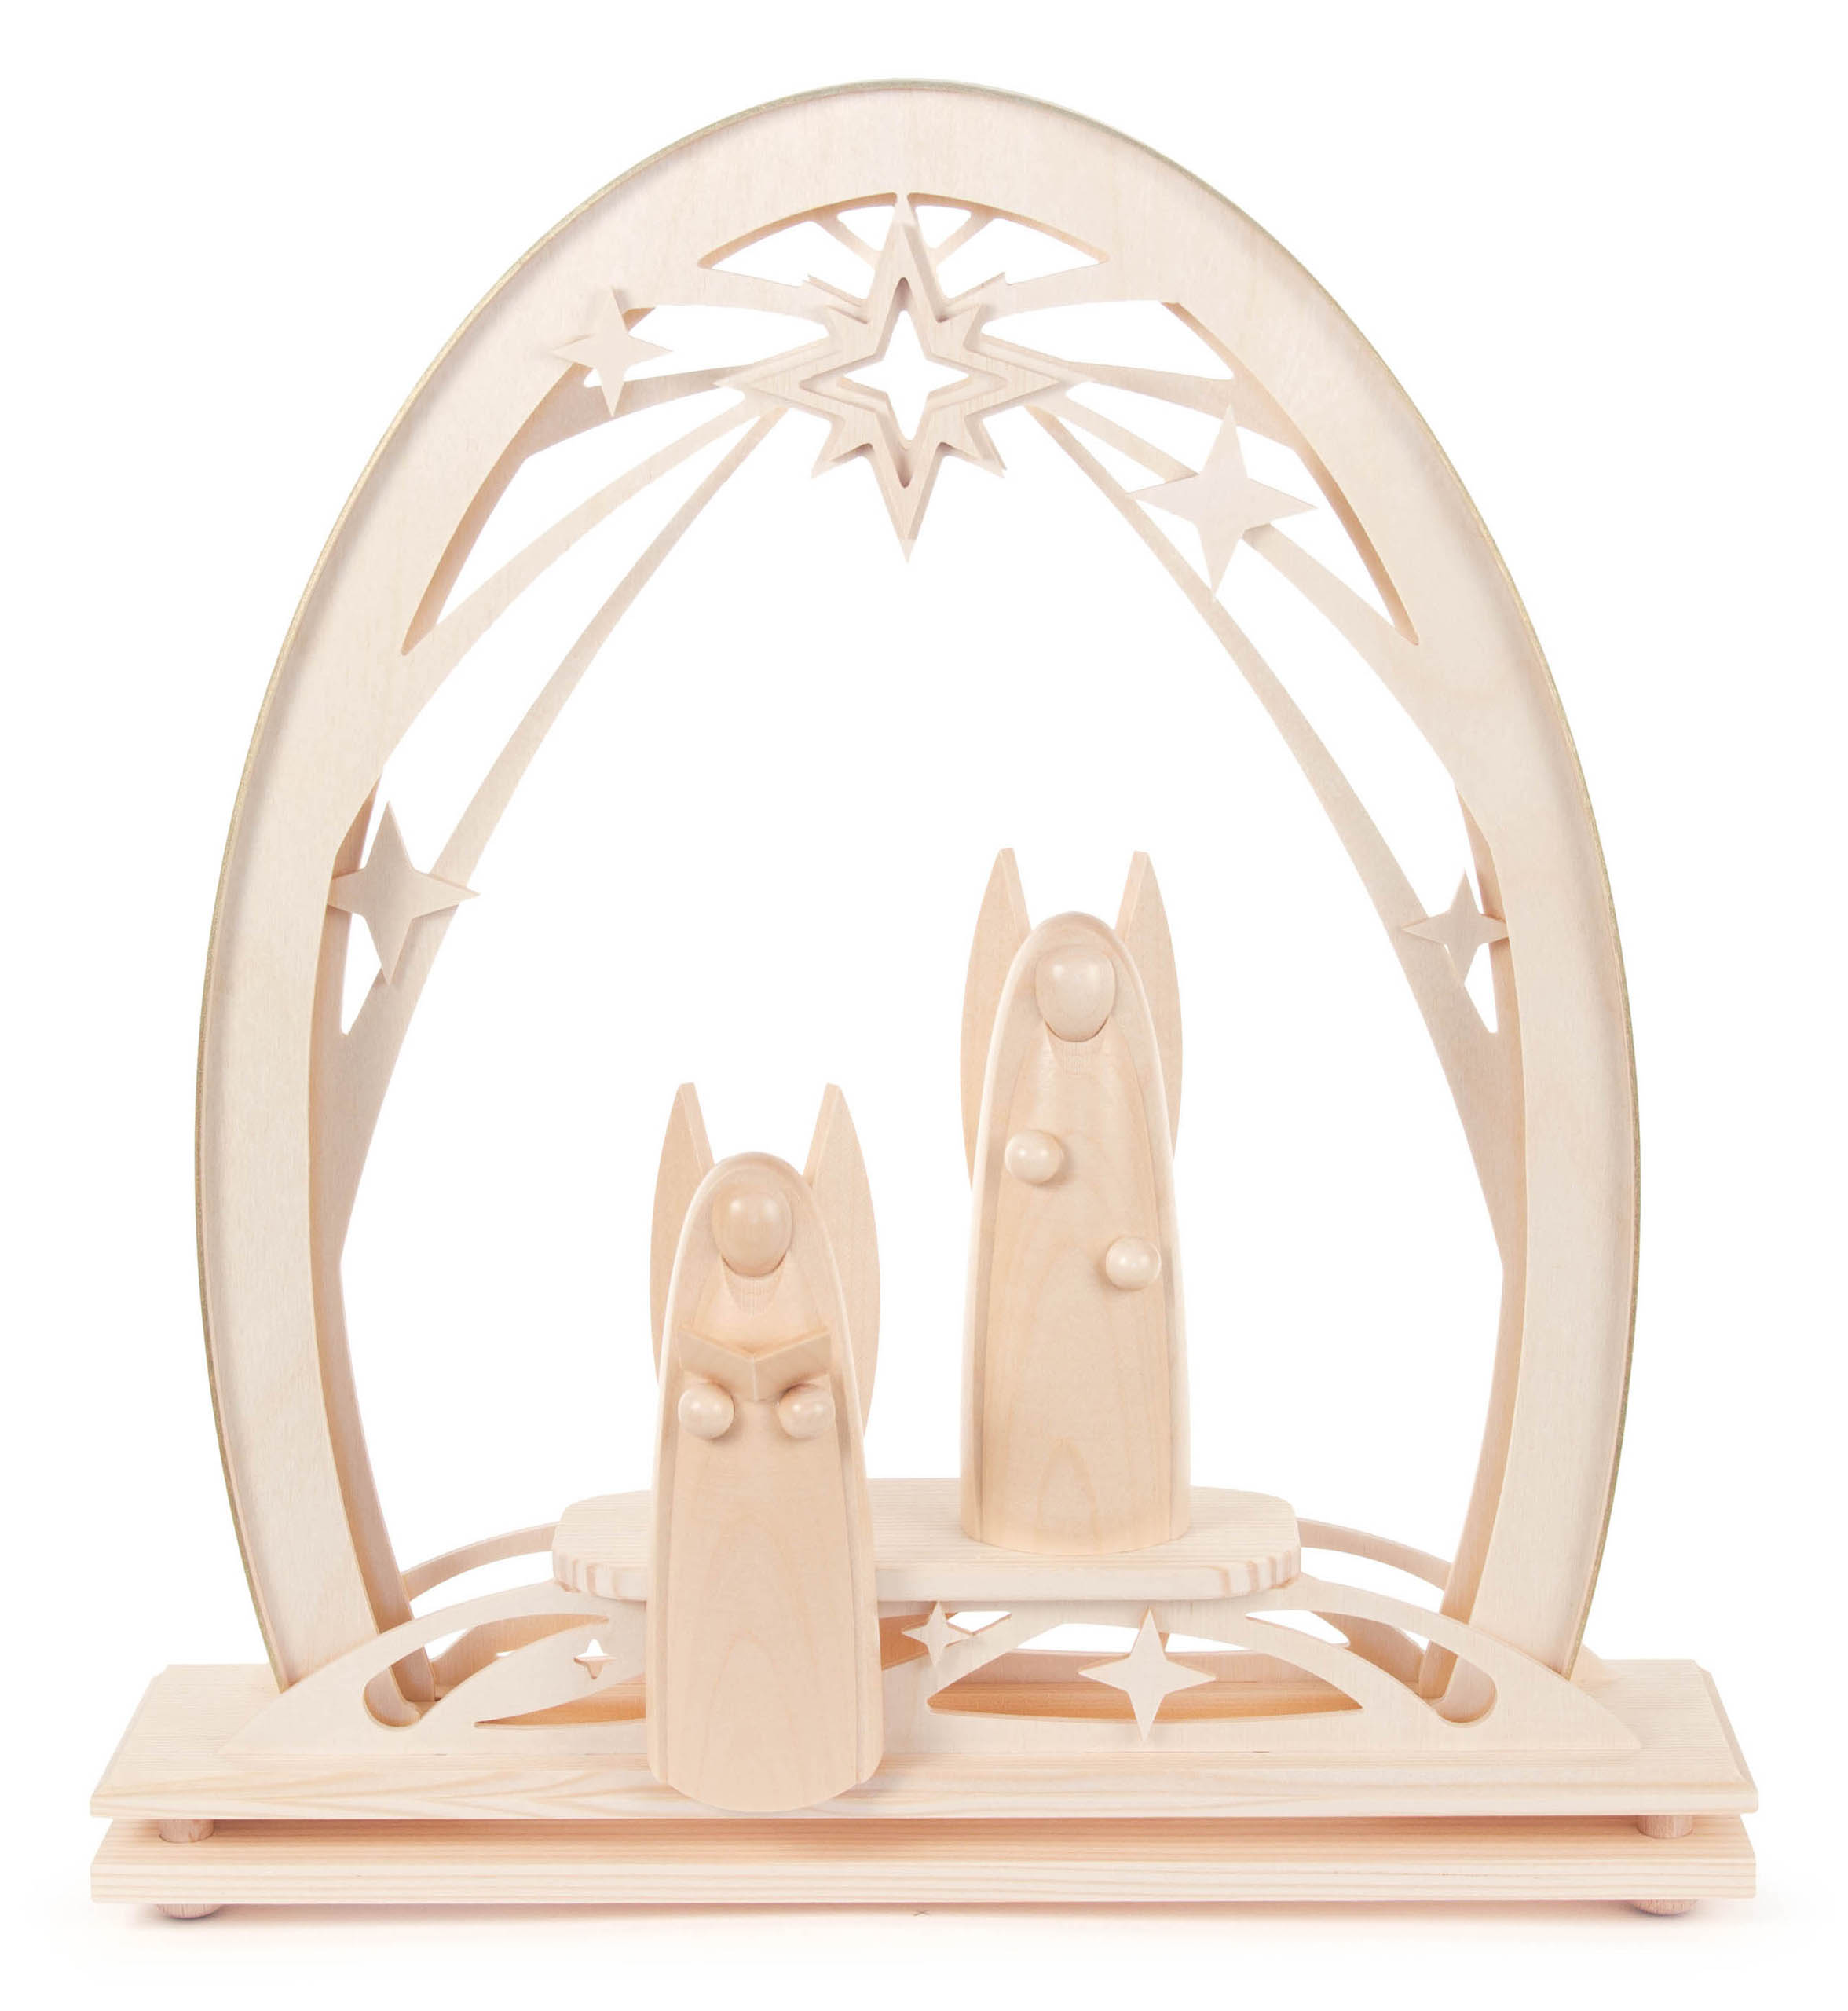 Fretwork Arch w/Angels, Indirect Lighting- 12″ x 13″